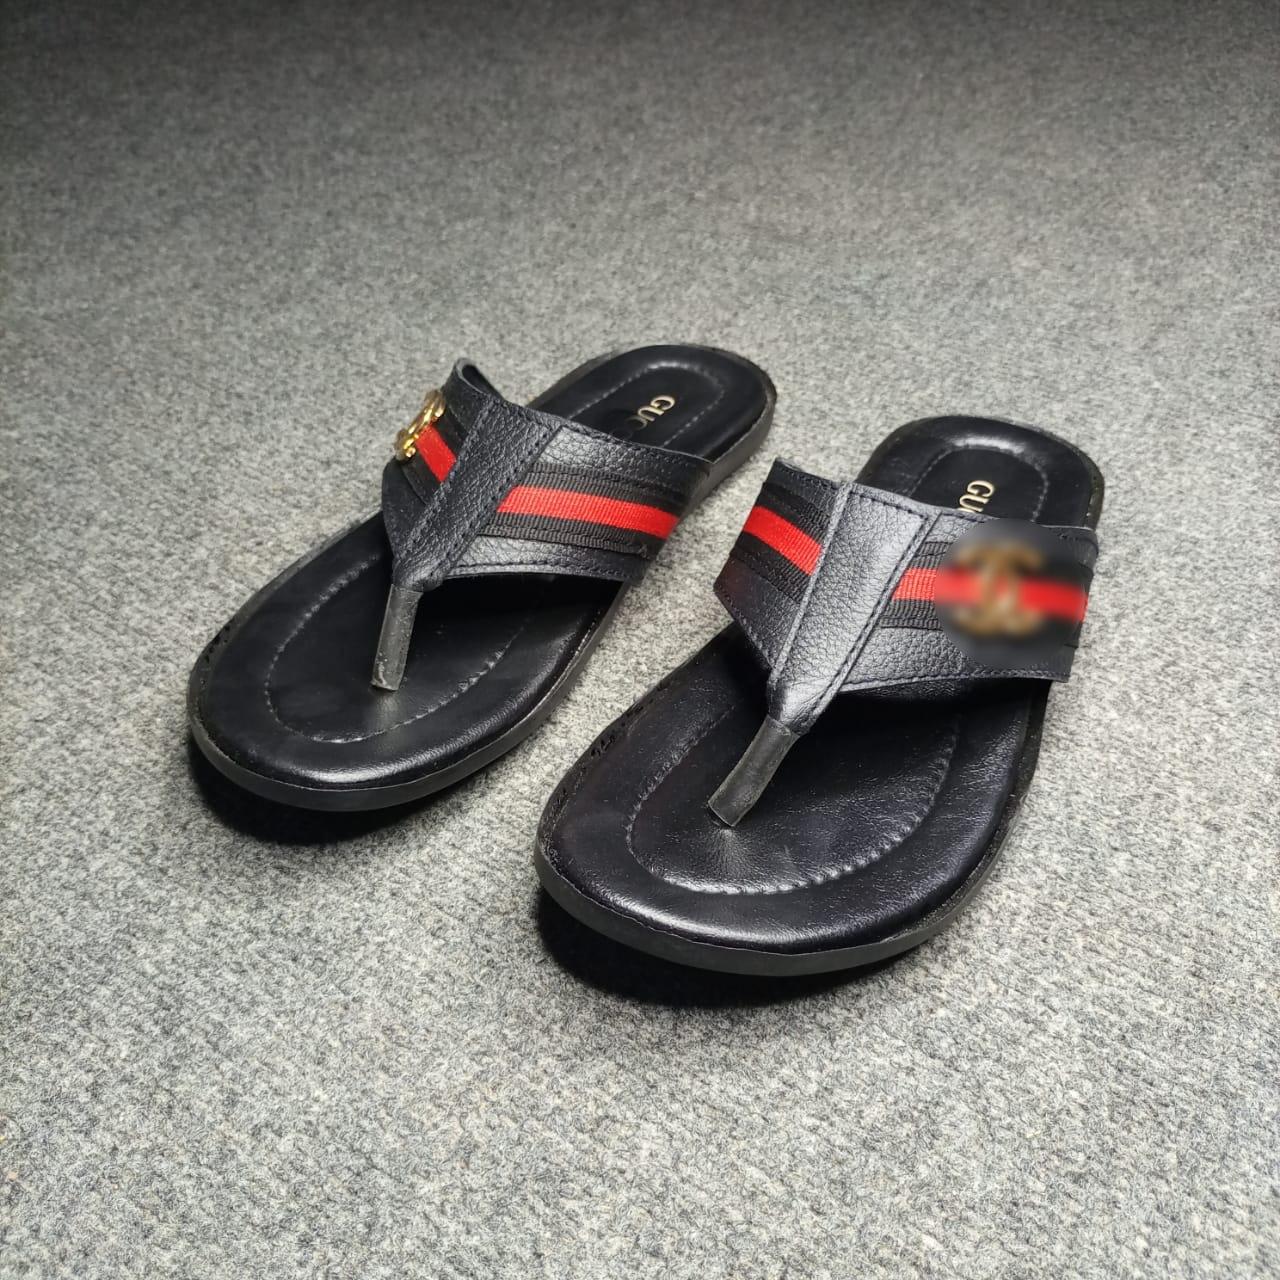 (MK) - Black ,Brown & Maroon Synthetic Material Flip Flop L001